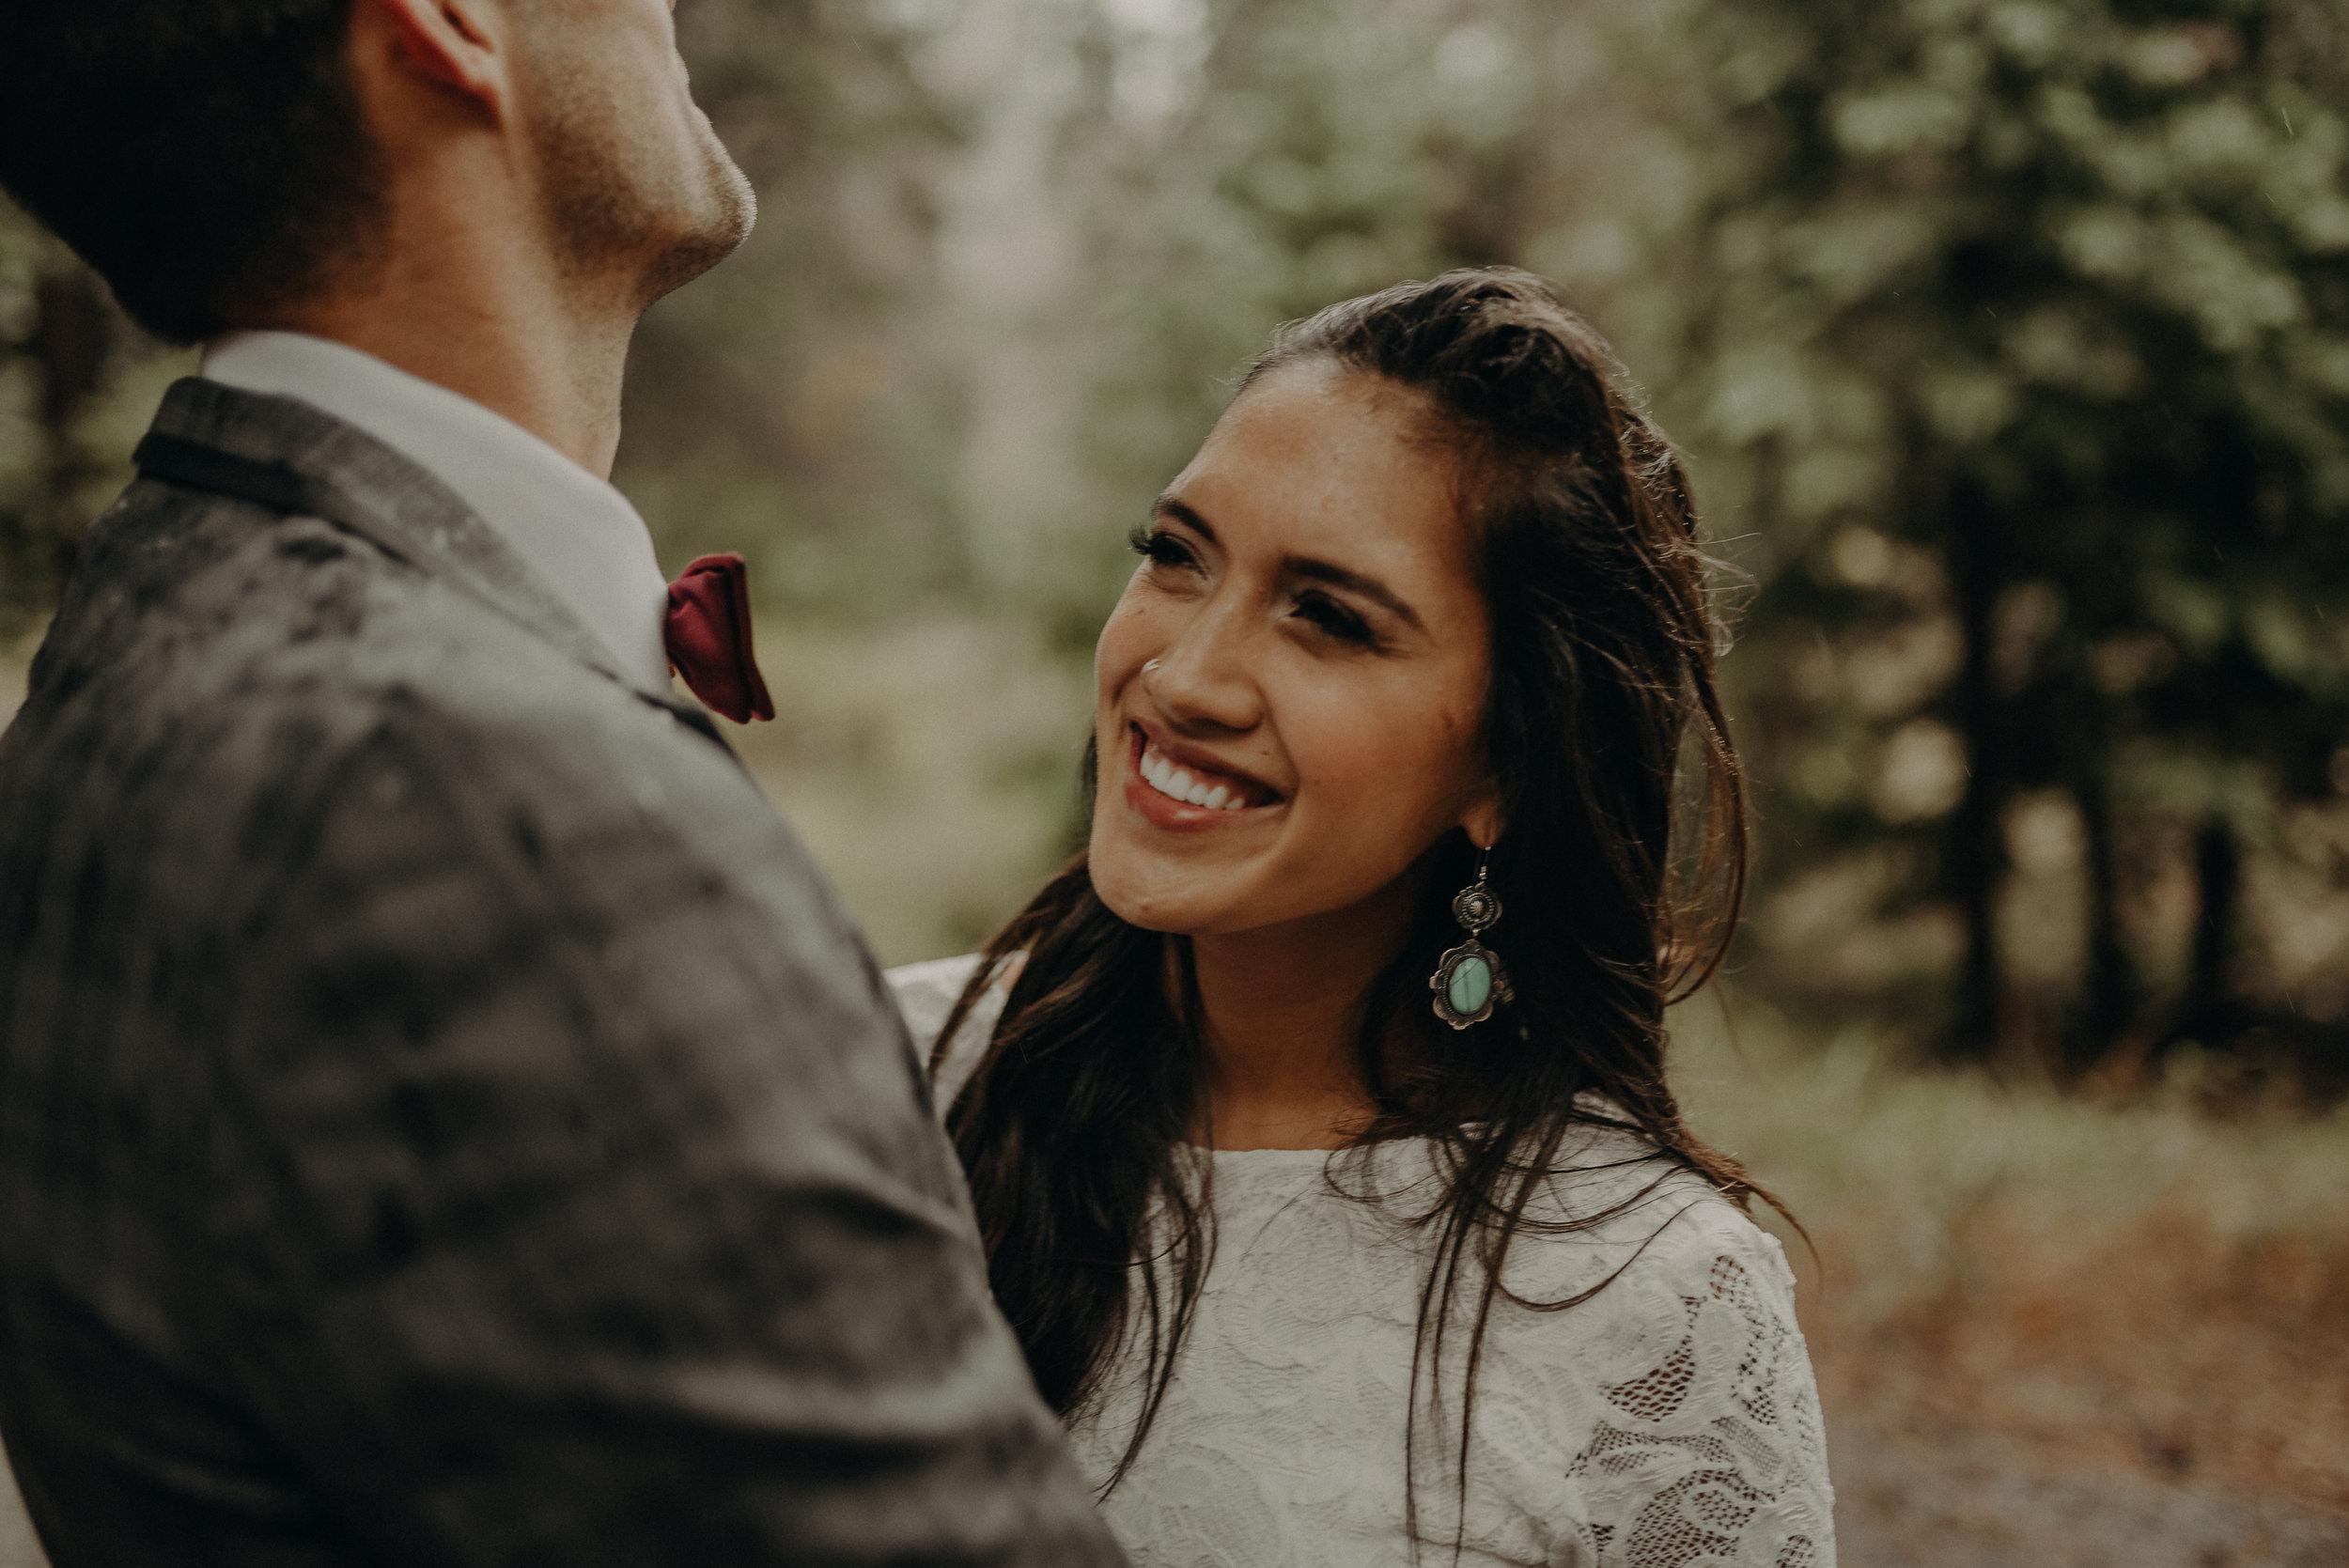 Isaiah + Taylor Photography - Yosemite Elopement - Los Angeles Wedding Photographer-16.jpg